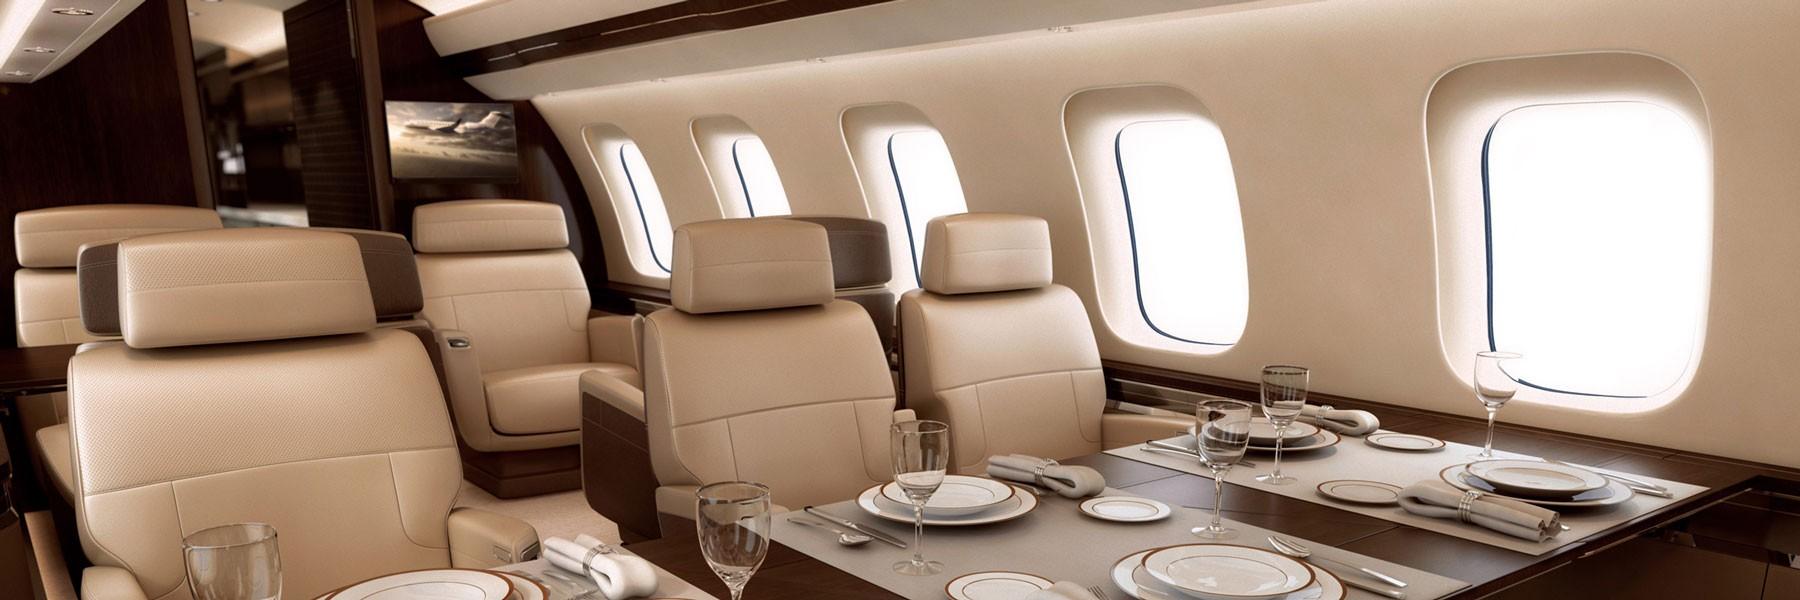 Global 7500 cabin design